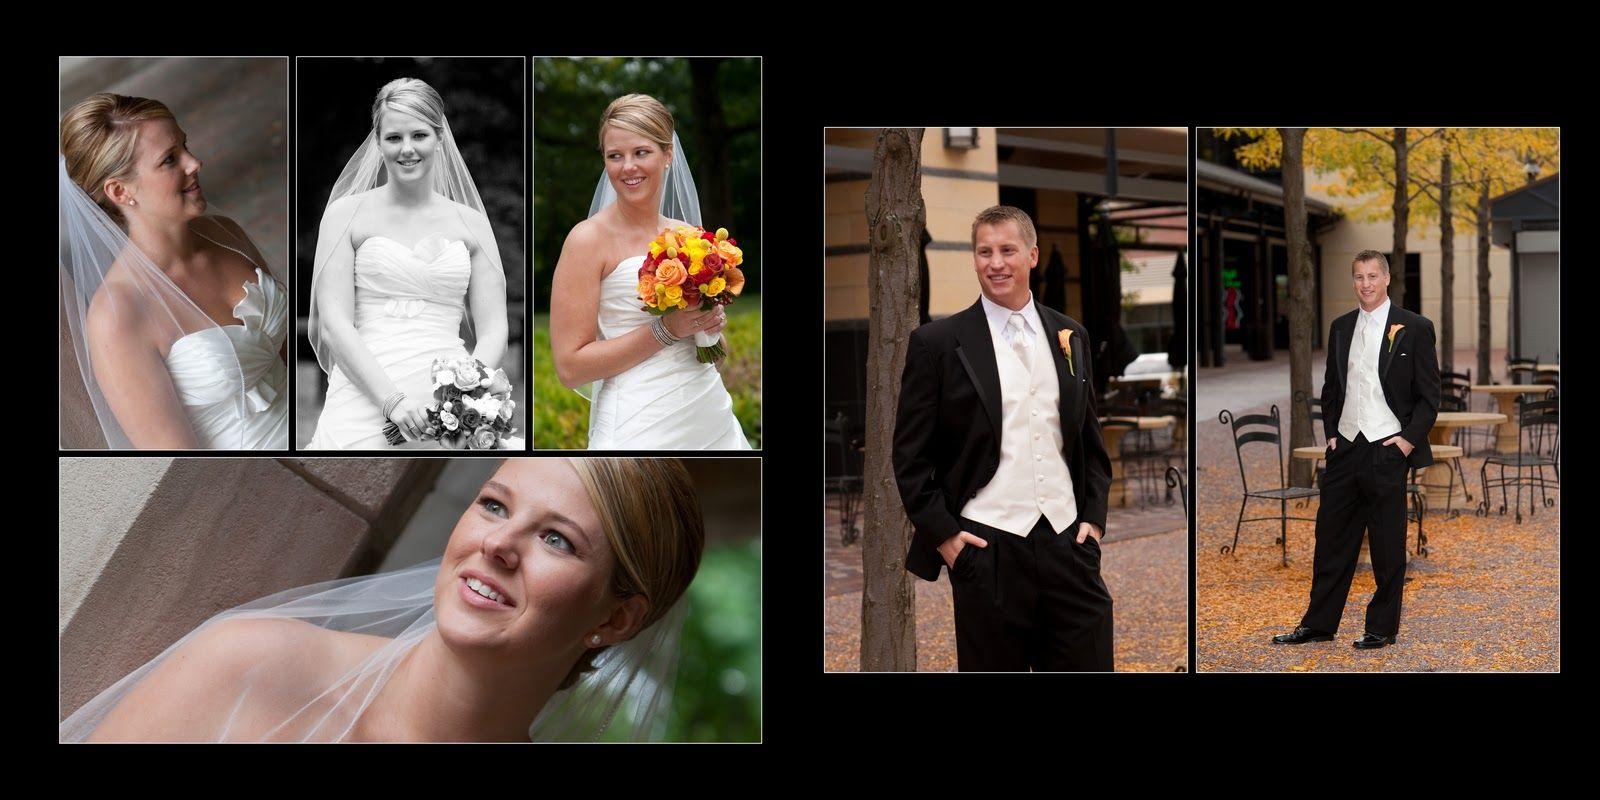 Wedding Album Design Ideas wedding photography album layouts youtube Wedding Album Design Pages Google Search Album Pages Pinterest Wedding Albums Wedding Album Design And Album Design